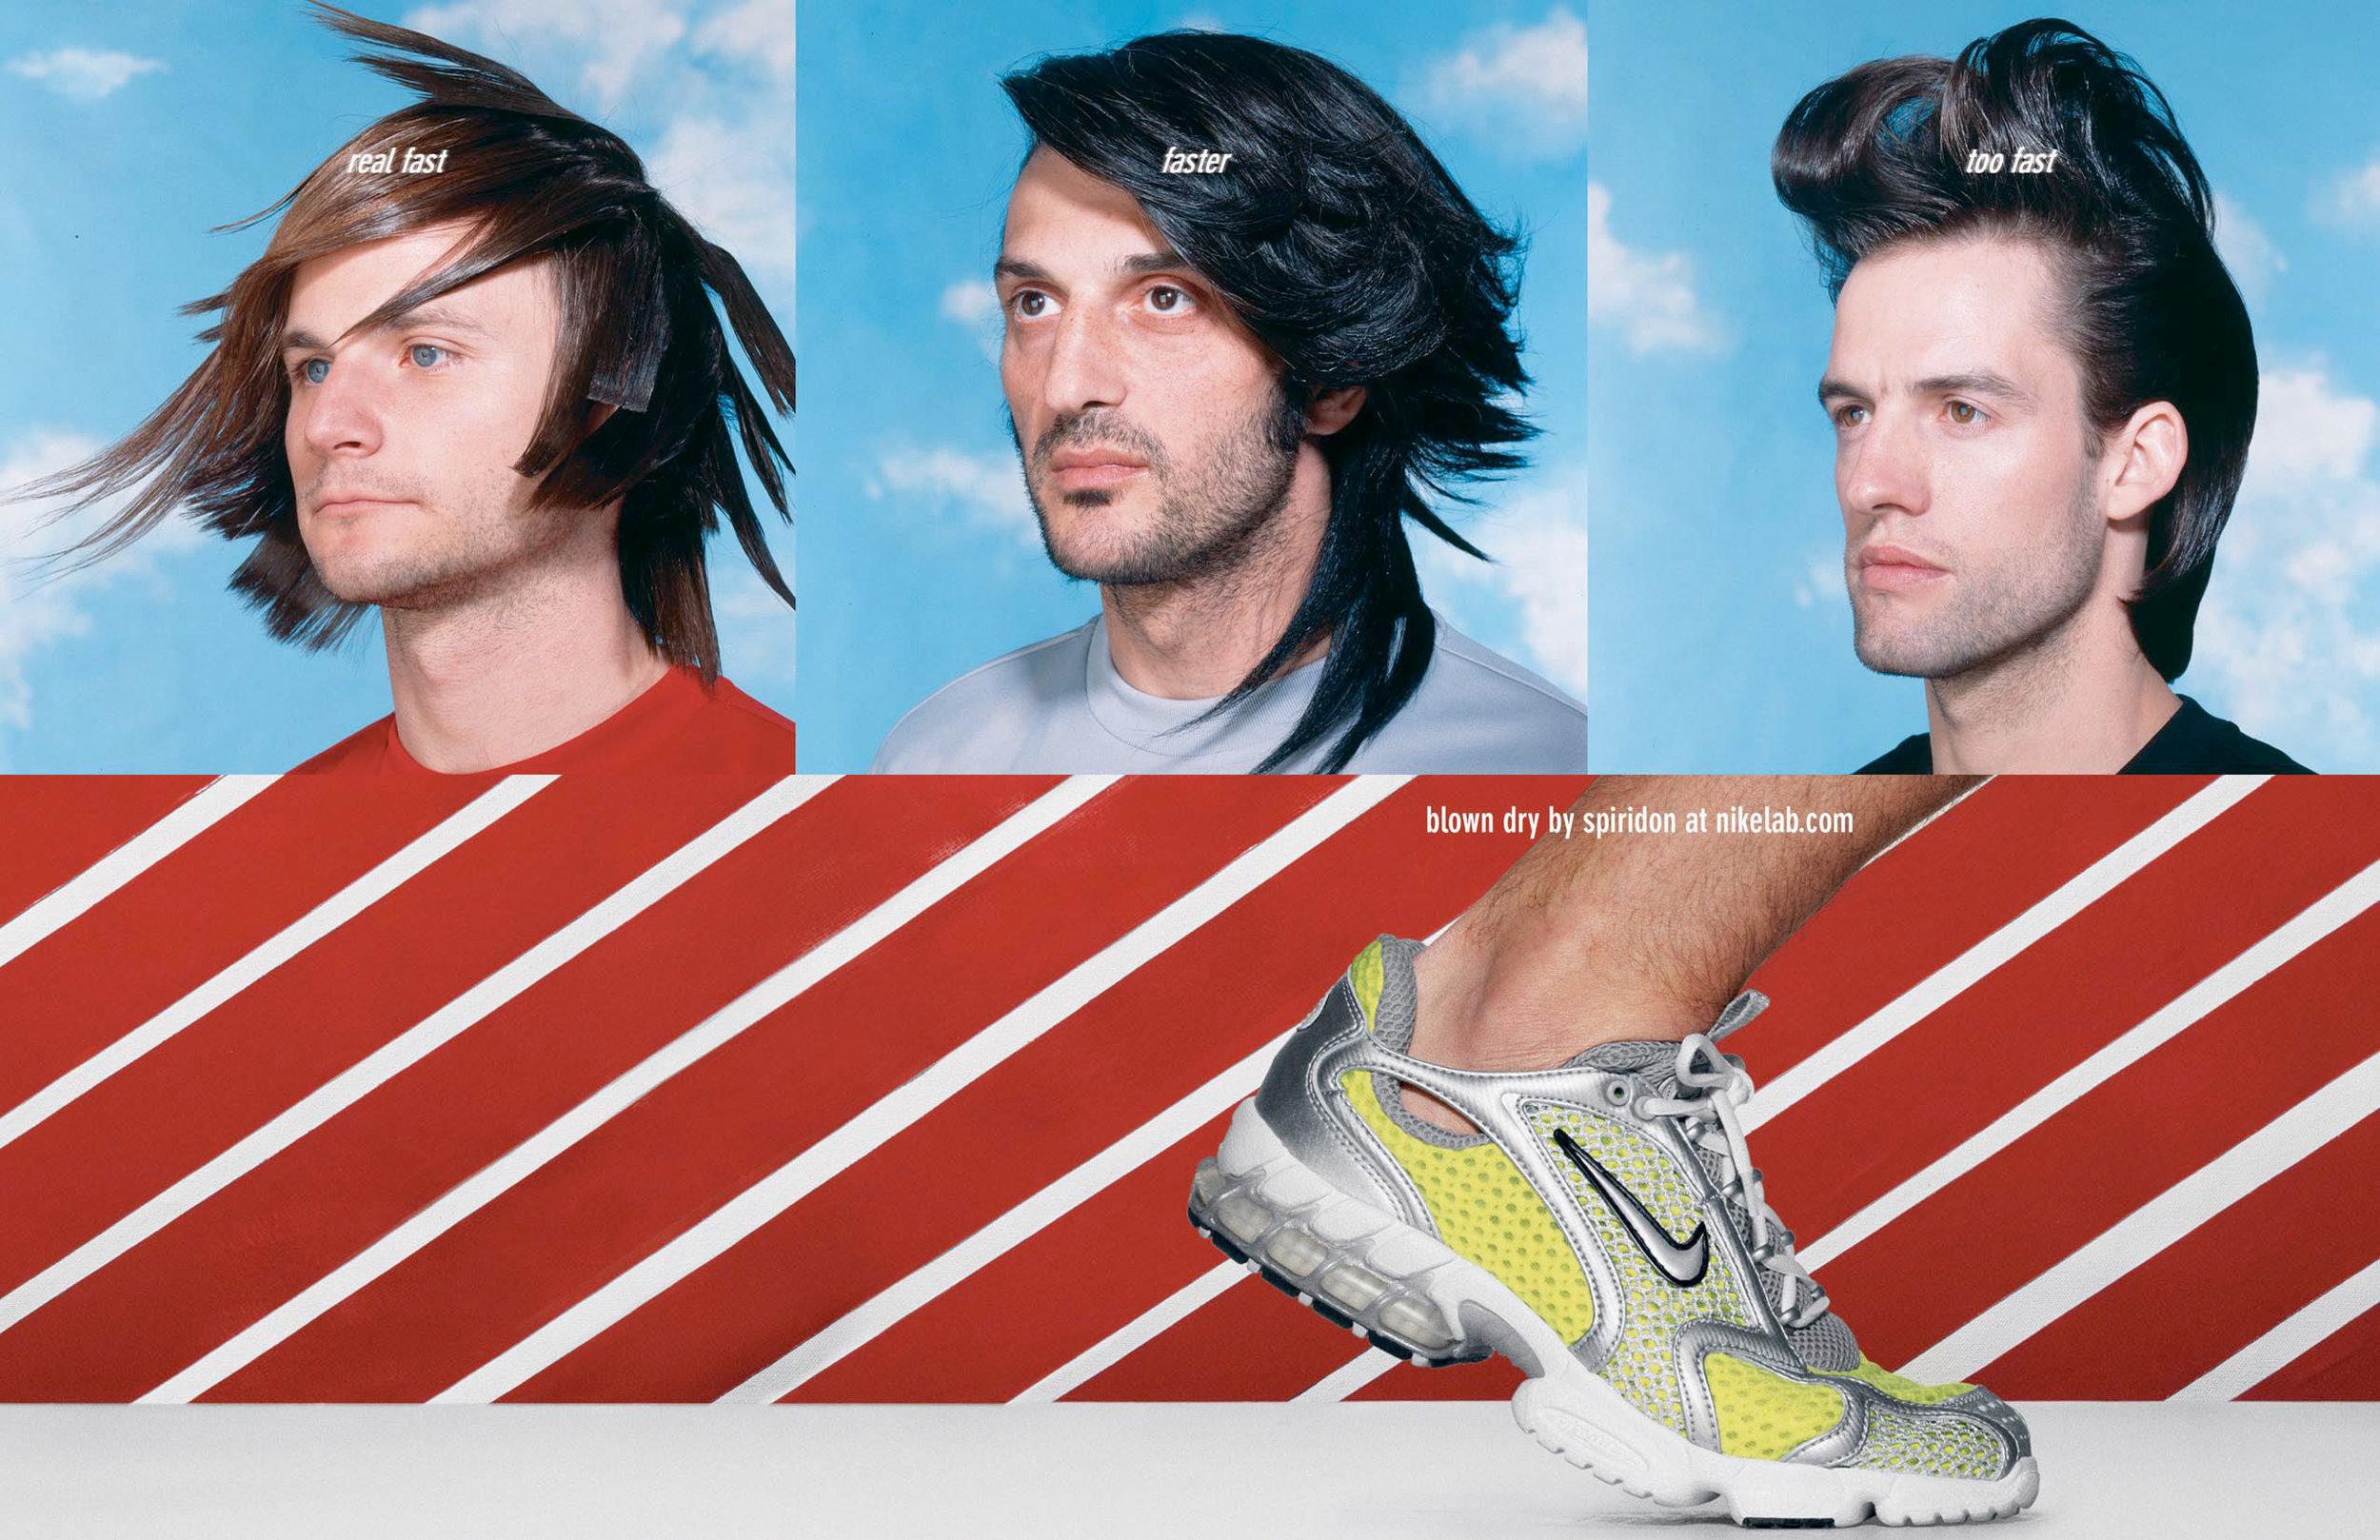 Nike-Spiridon shoe Ad.jpg